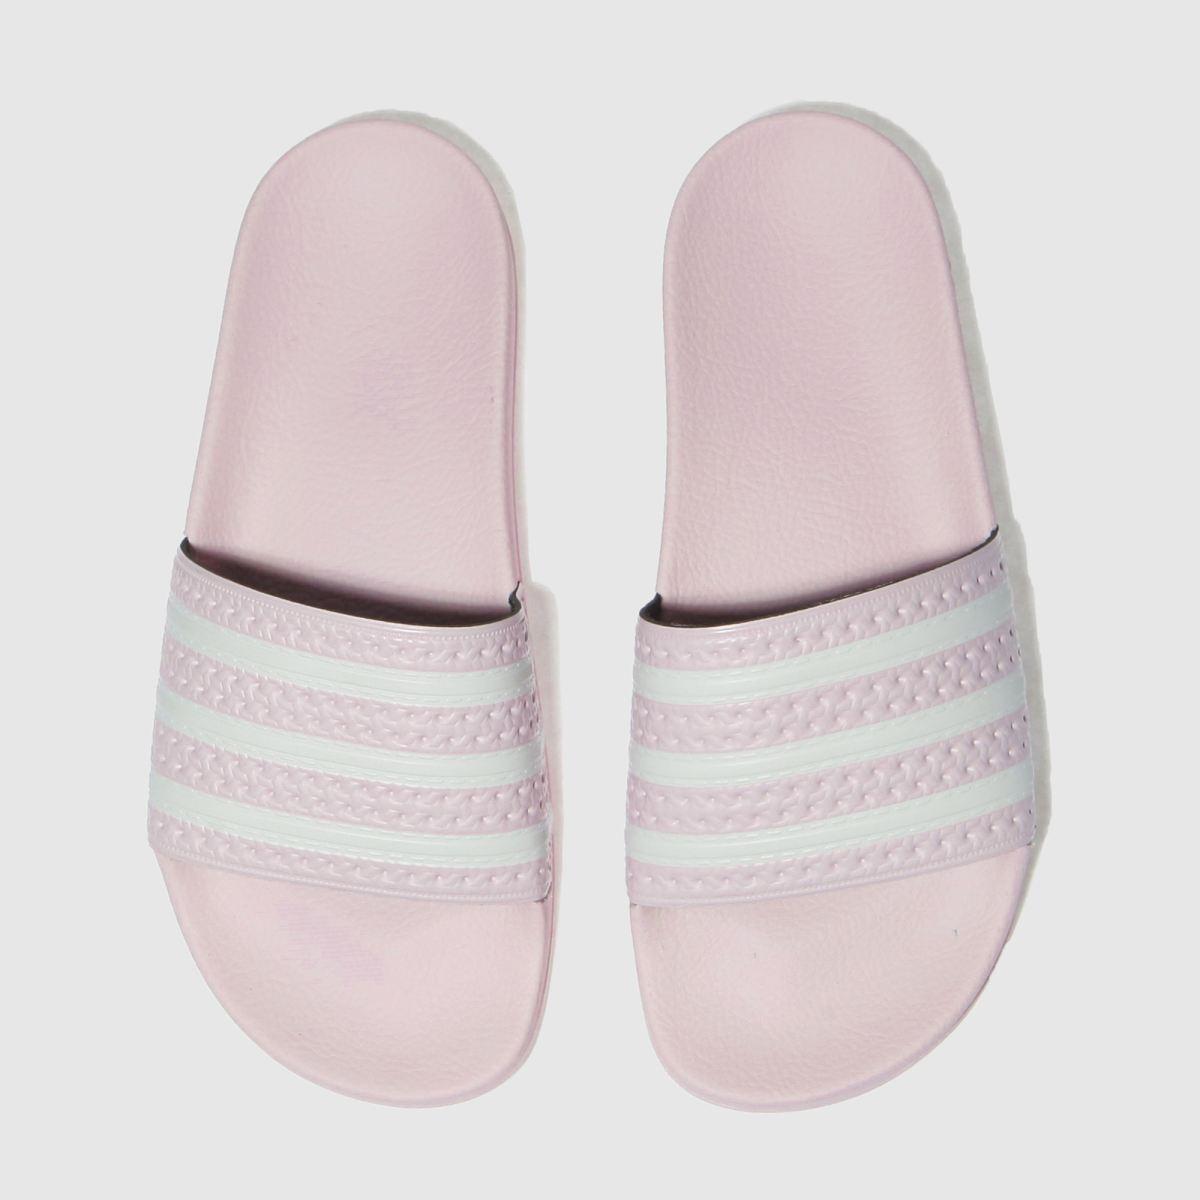 Adidas Pale Pink Adilette Sandals